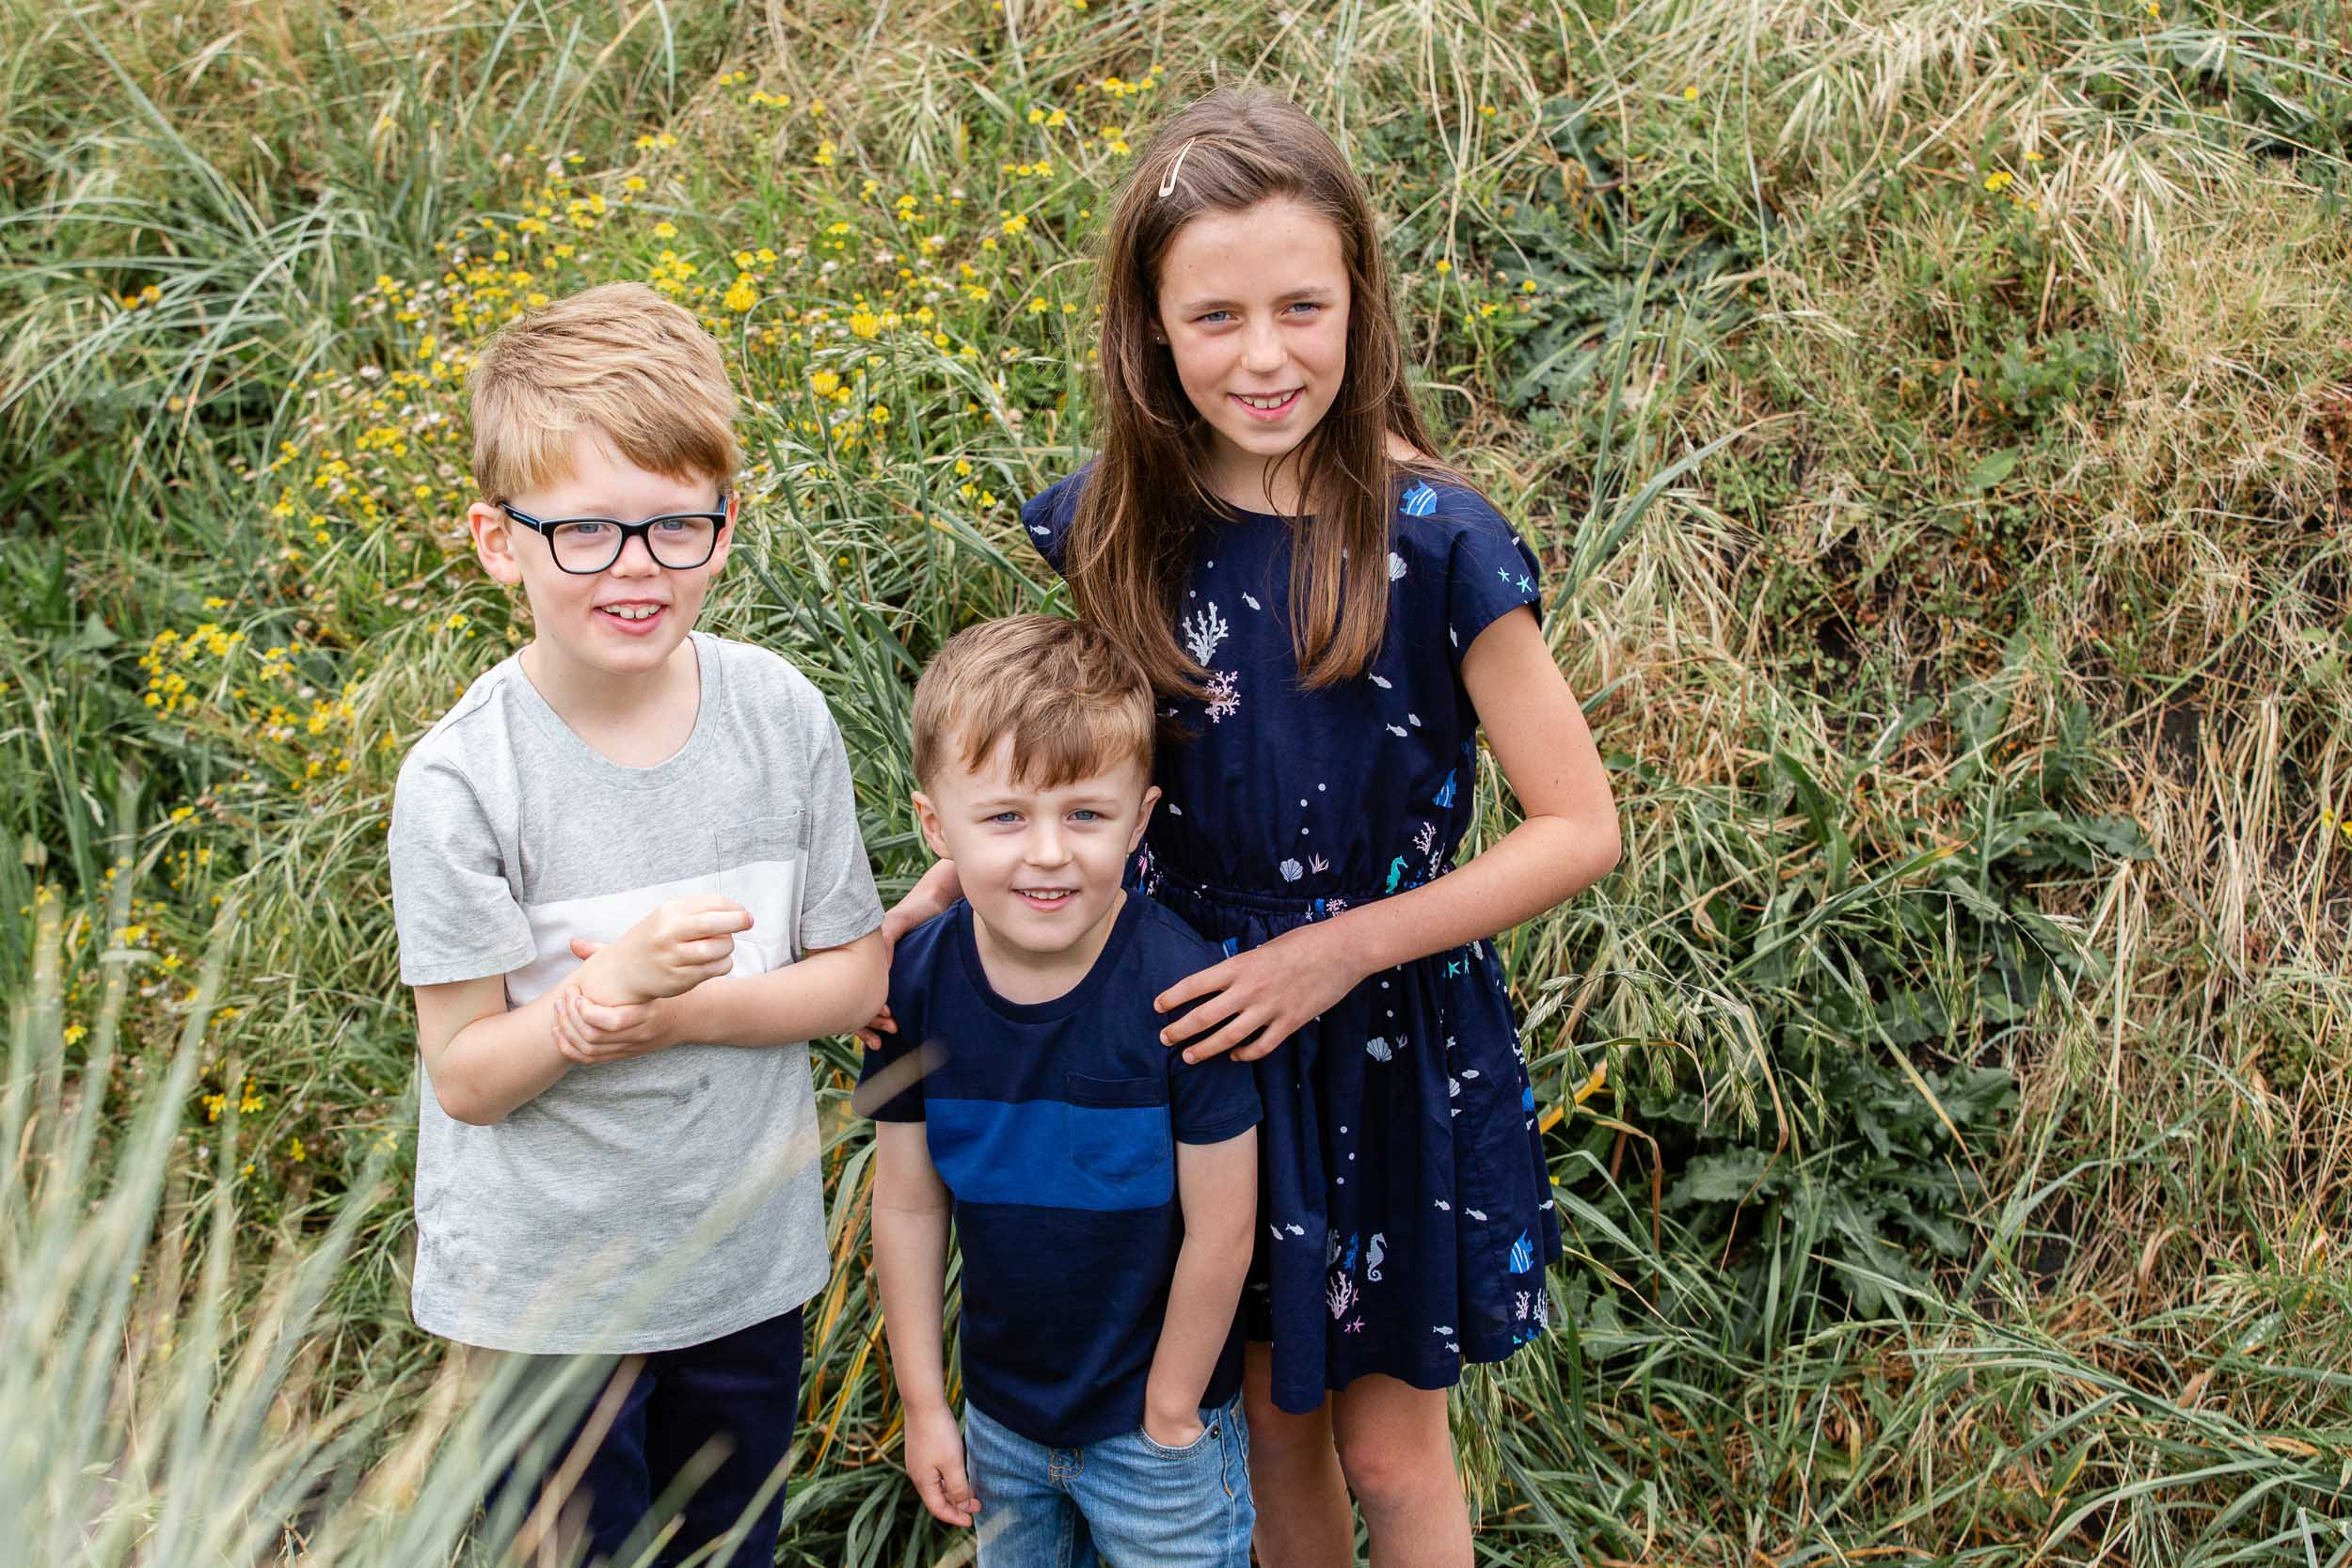 Aucklandfamilyphotographer (13 of 21).jpg